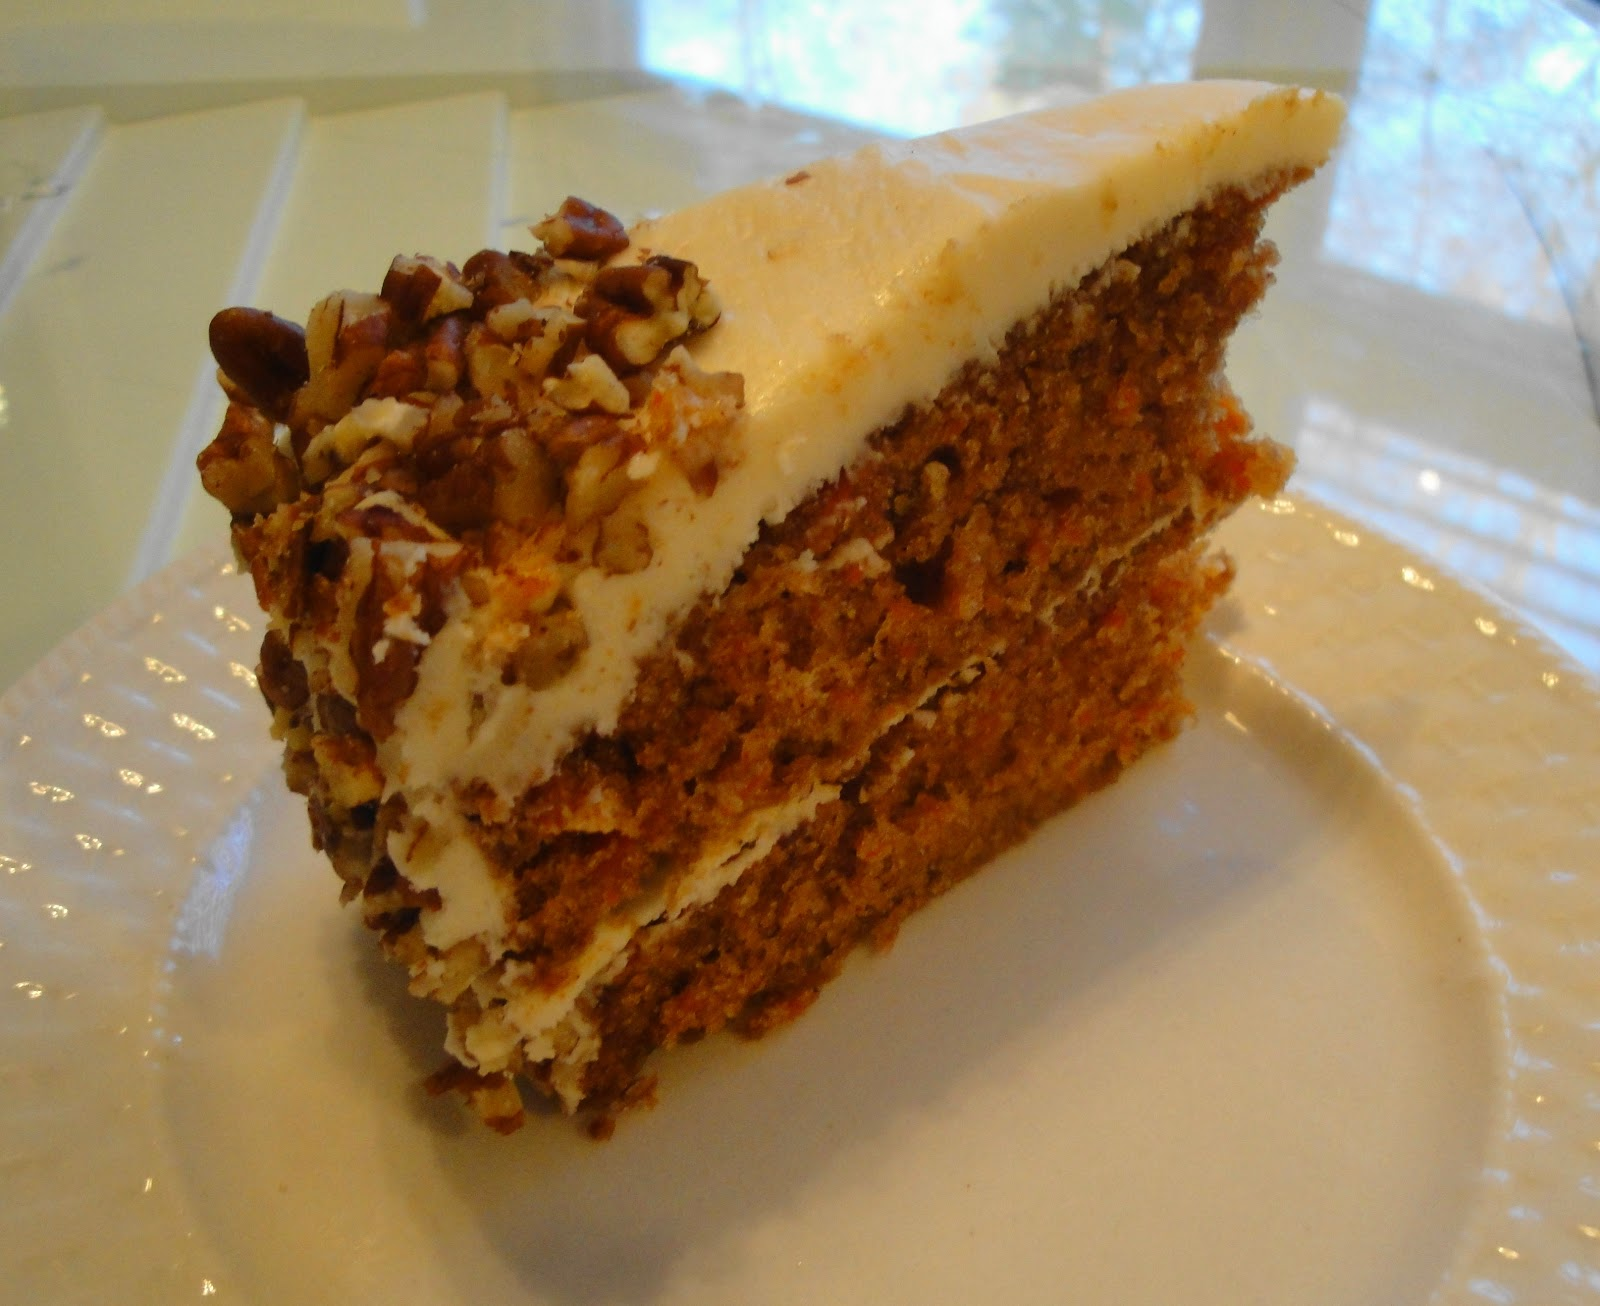 Homemade Cake With All Purpose Flour